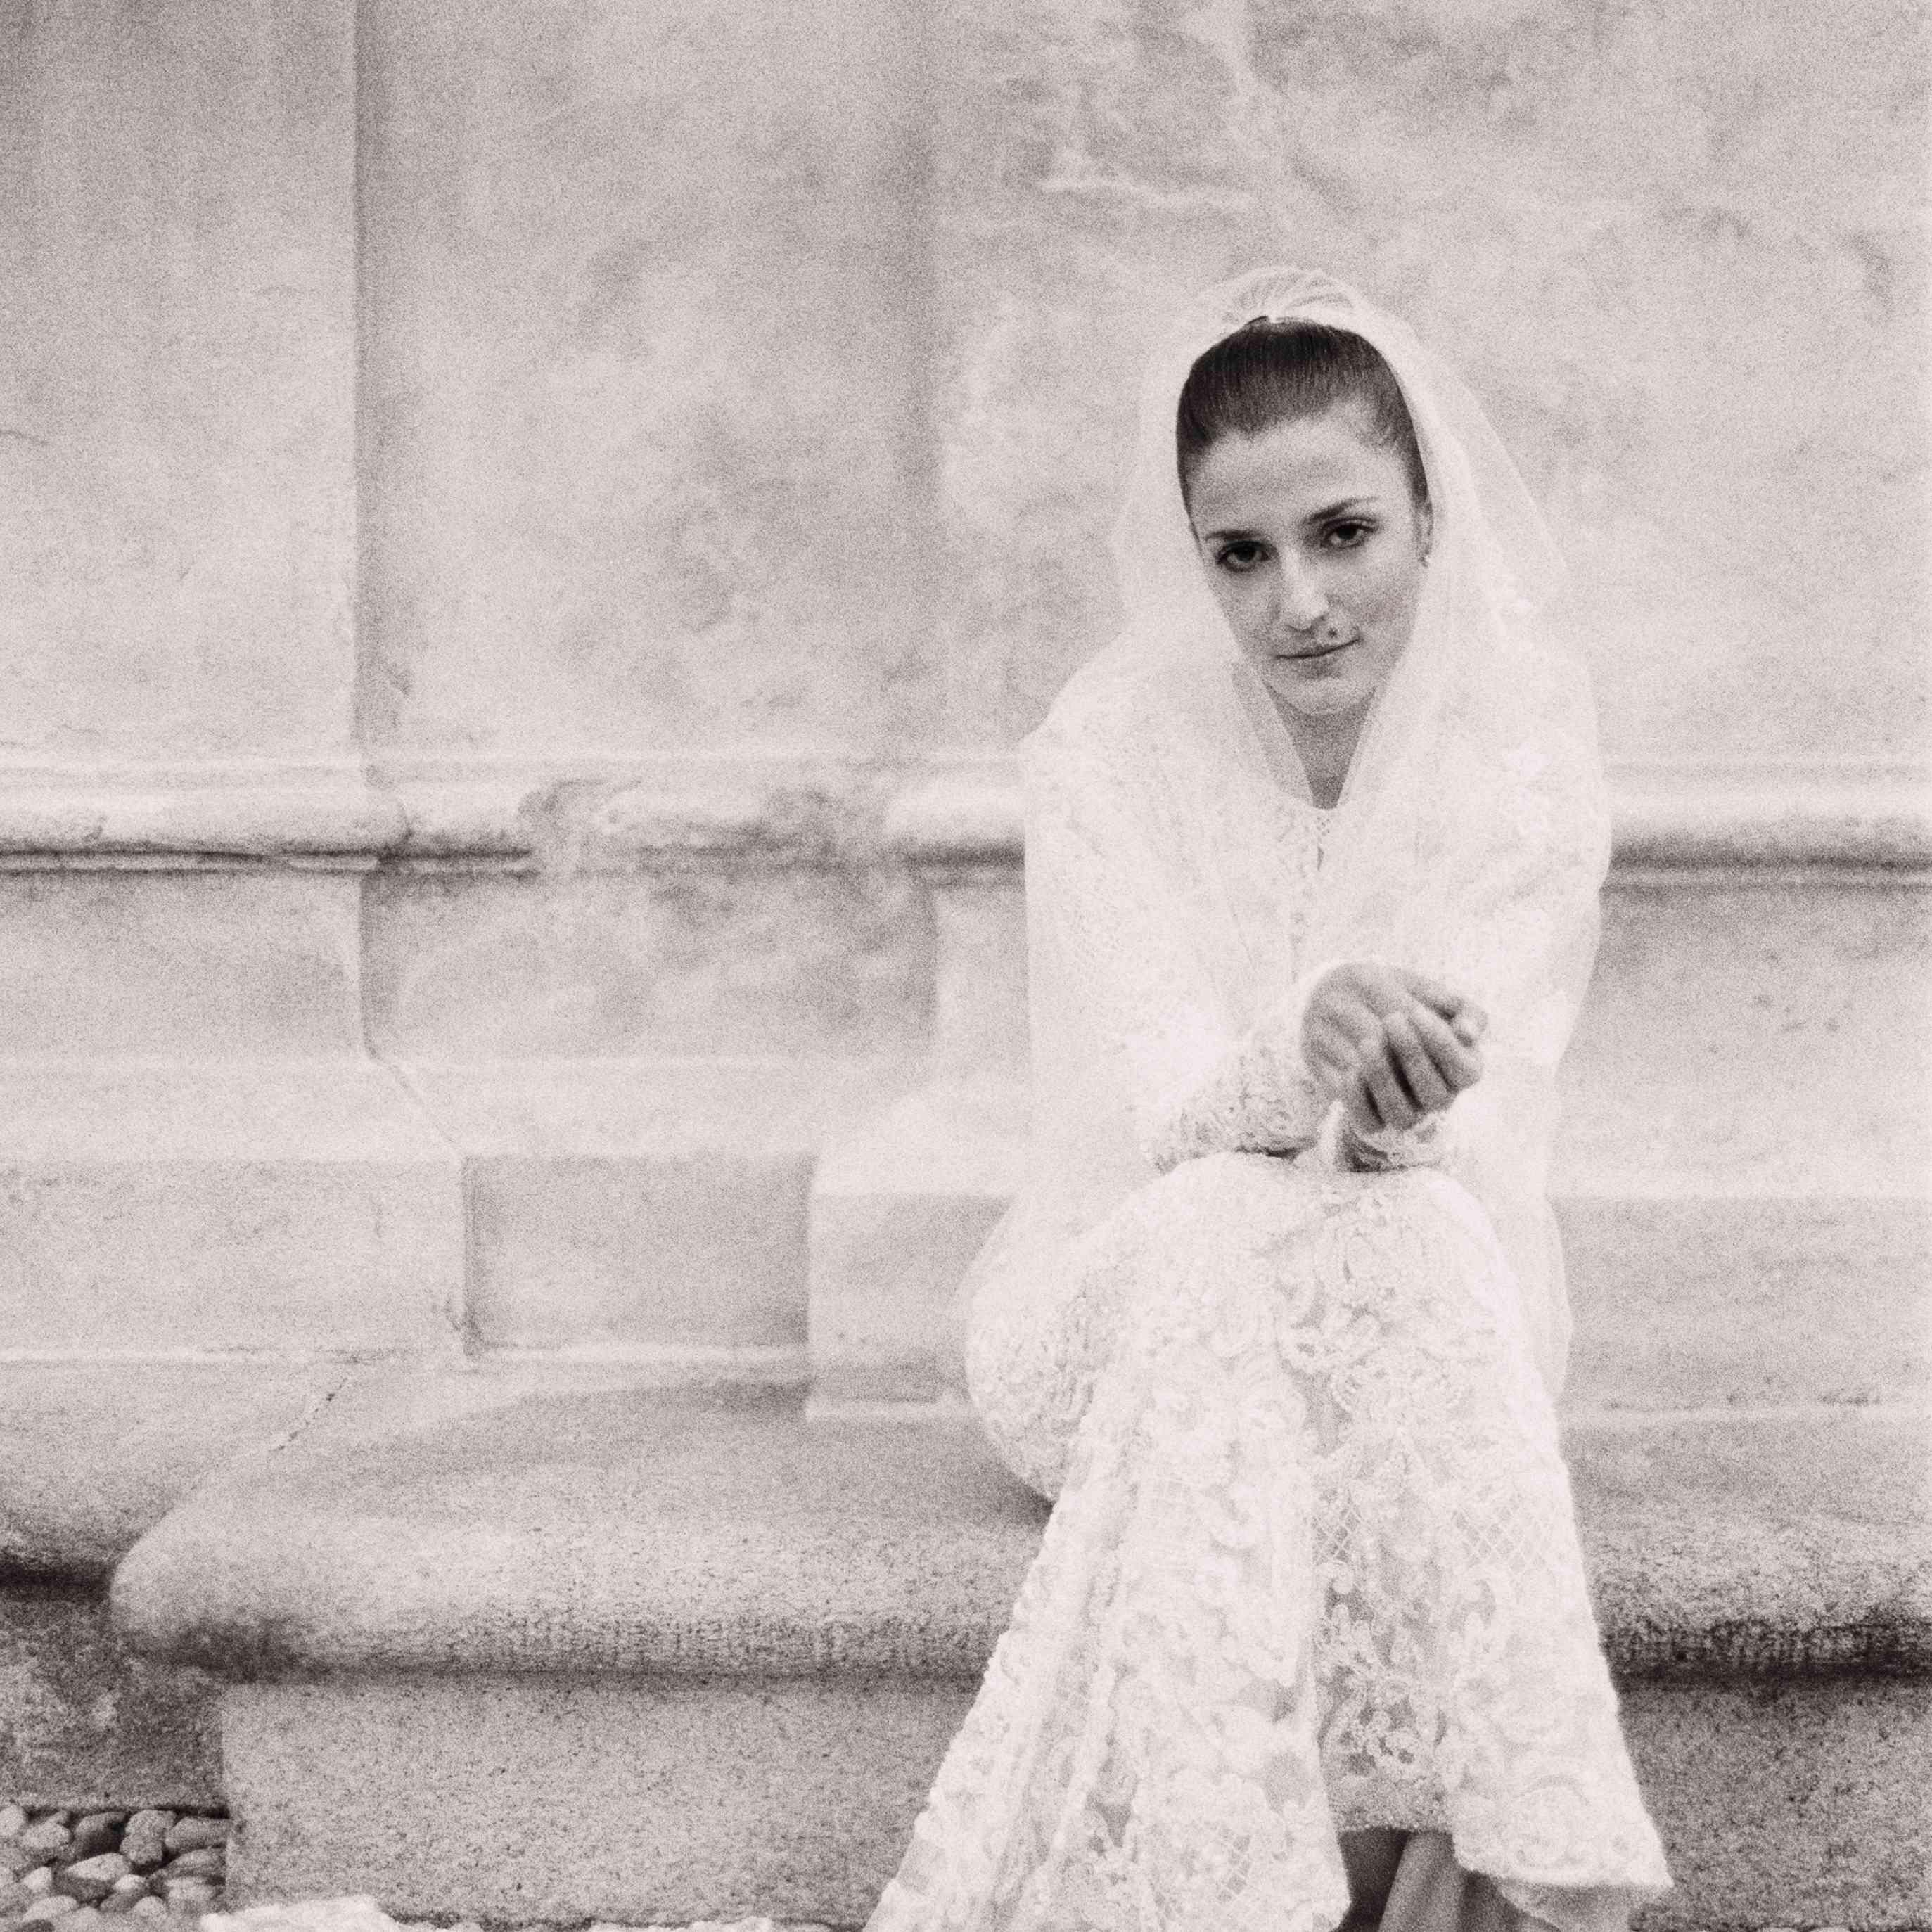 Northern Italian Wedding, Bridal Portrait